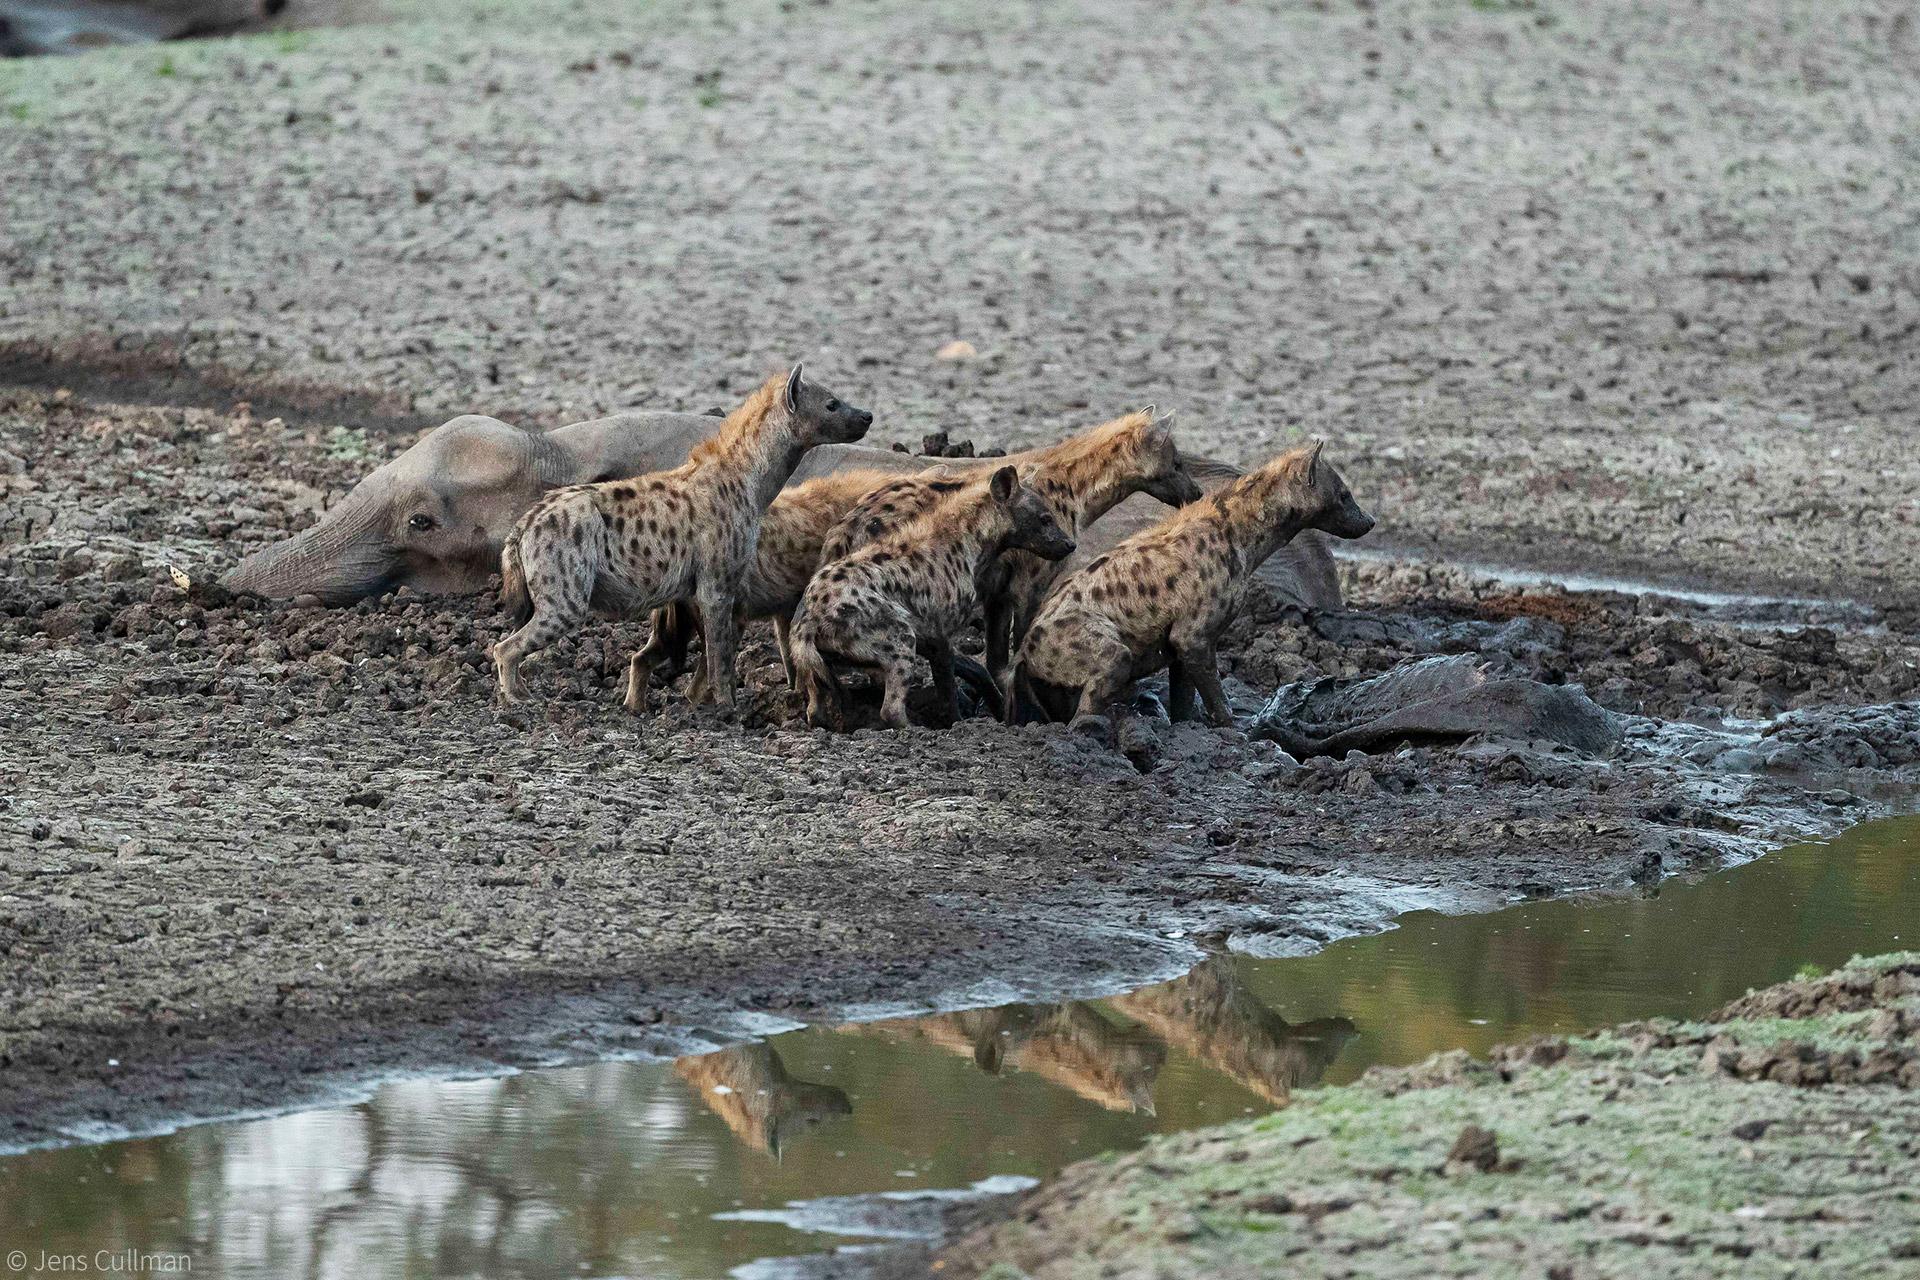 Hyenas eat baby elephant